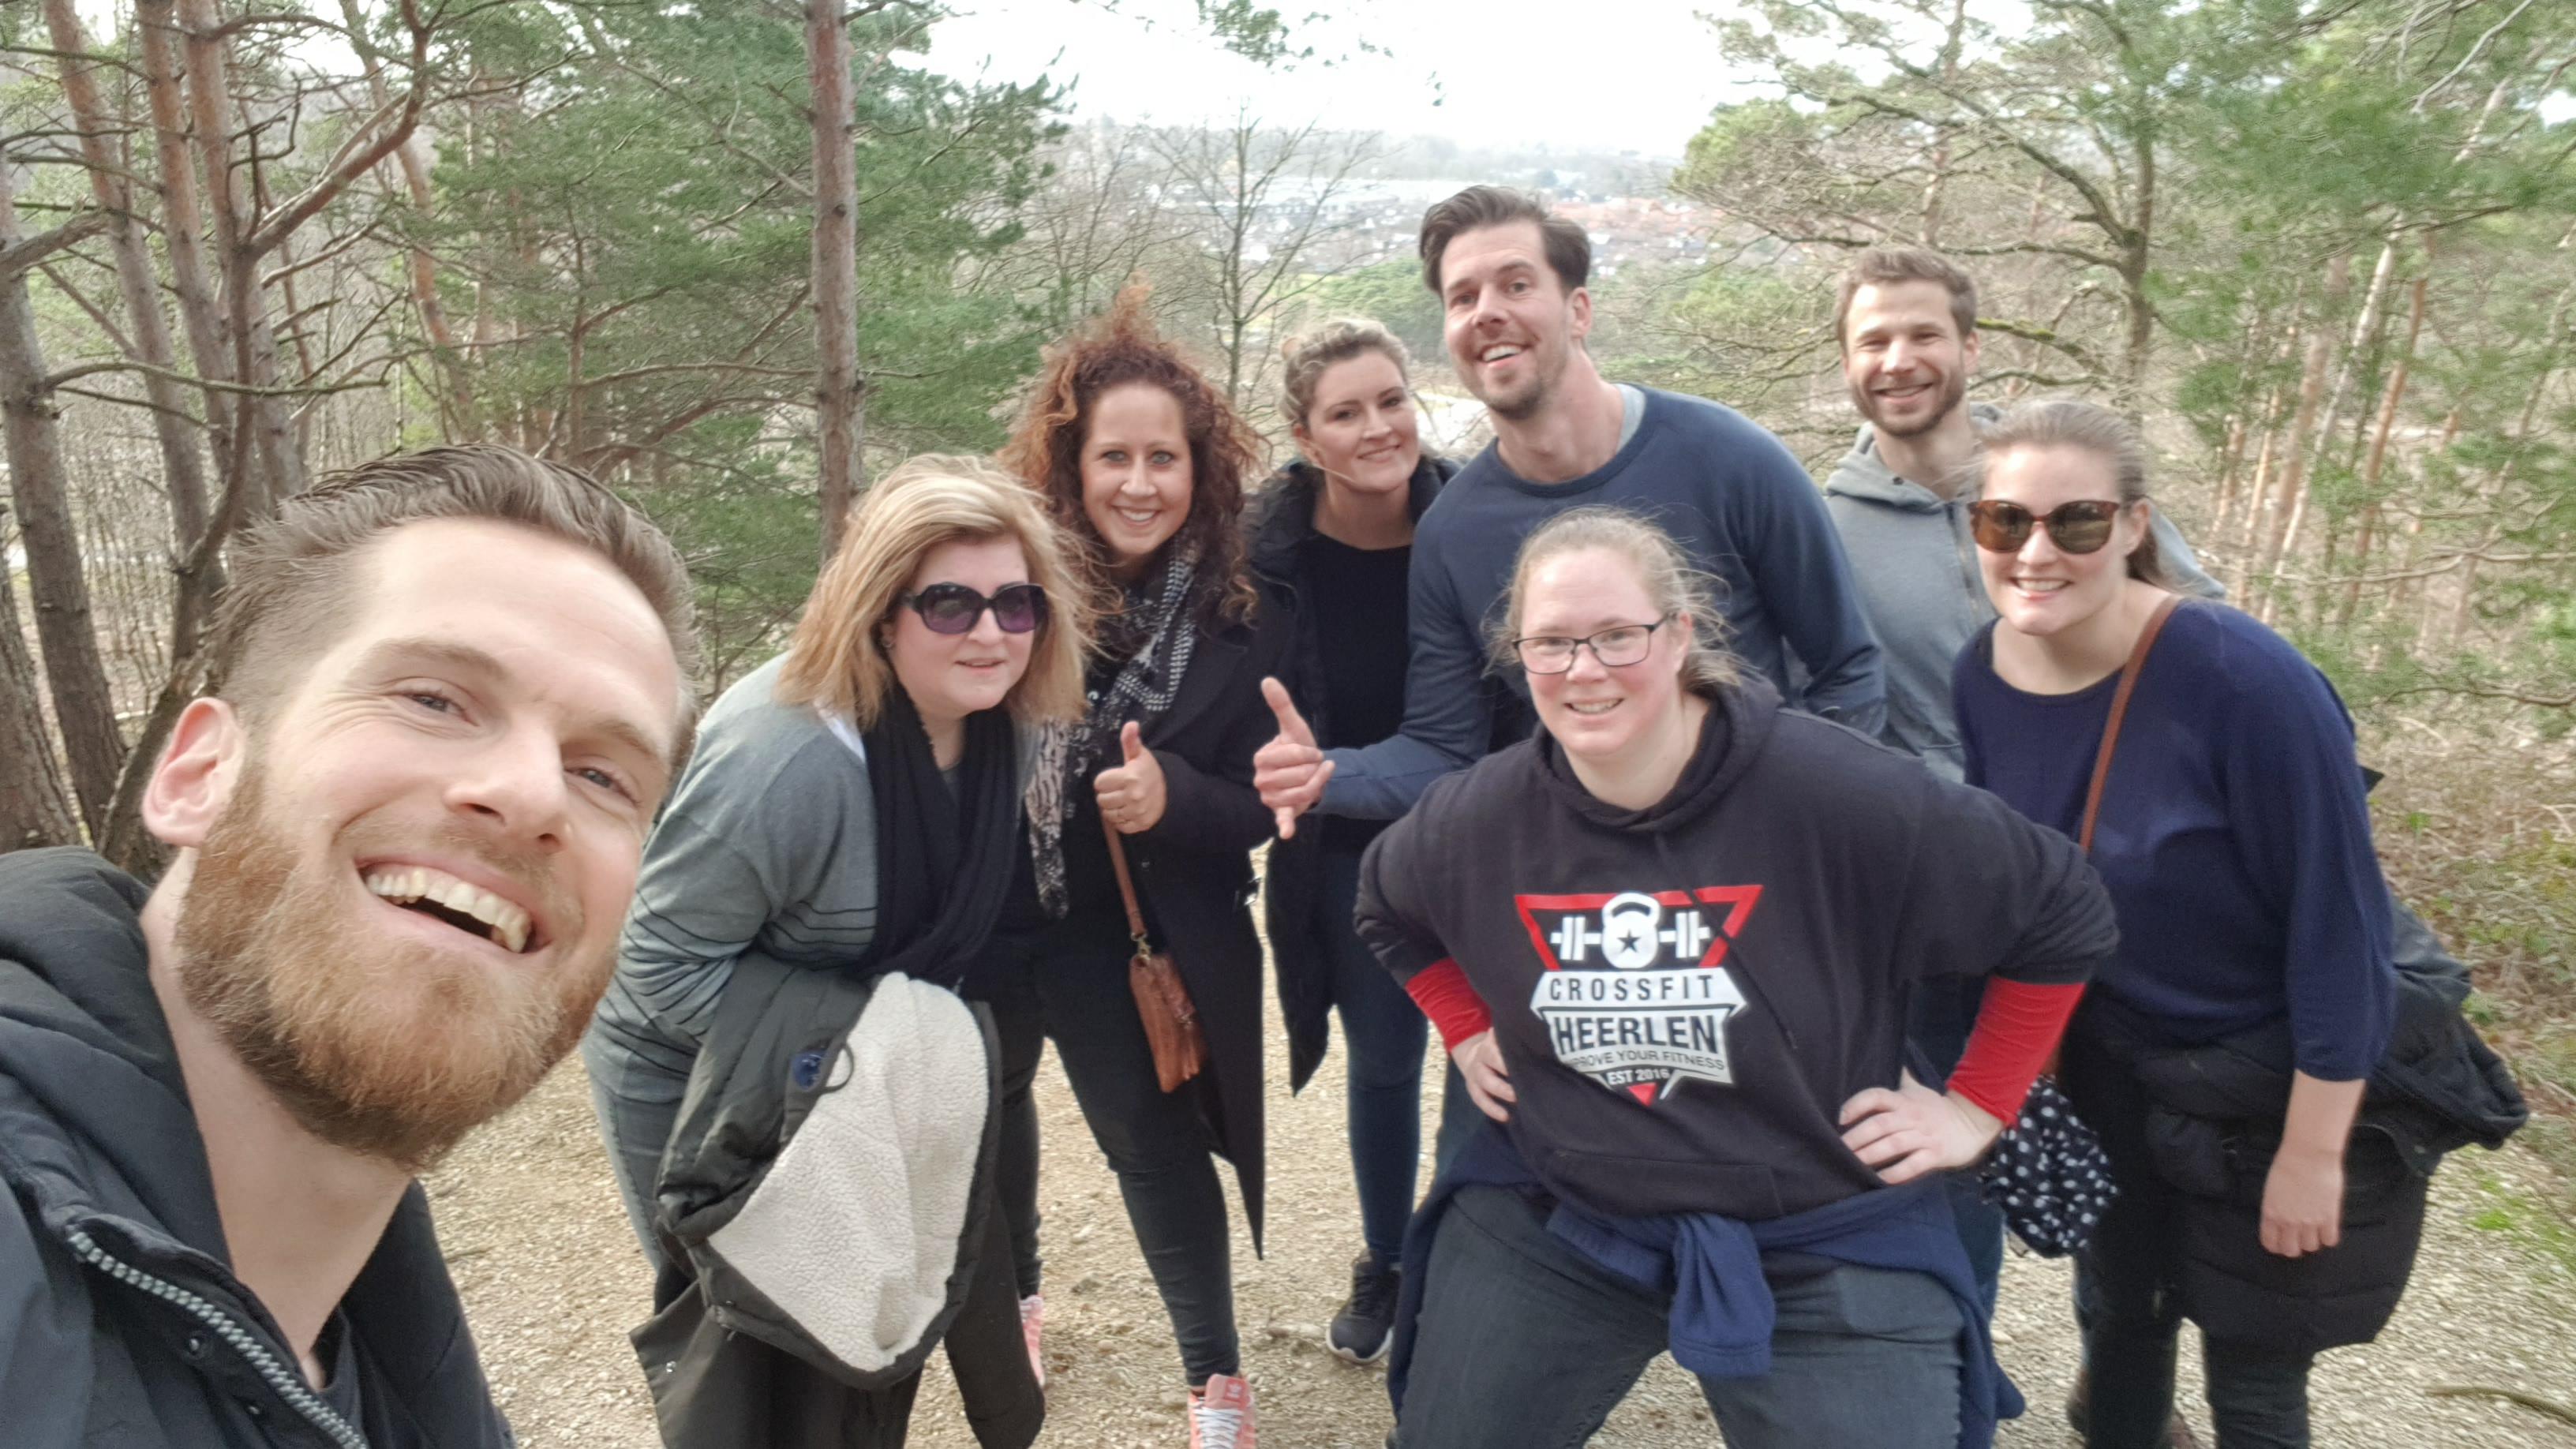 Vrijwilligers Trailrun Brunssummerheide 2020